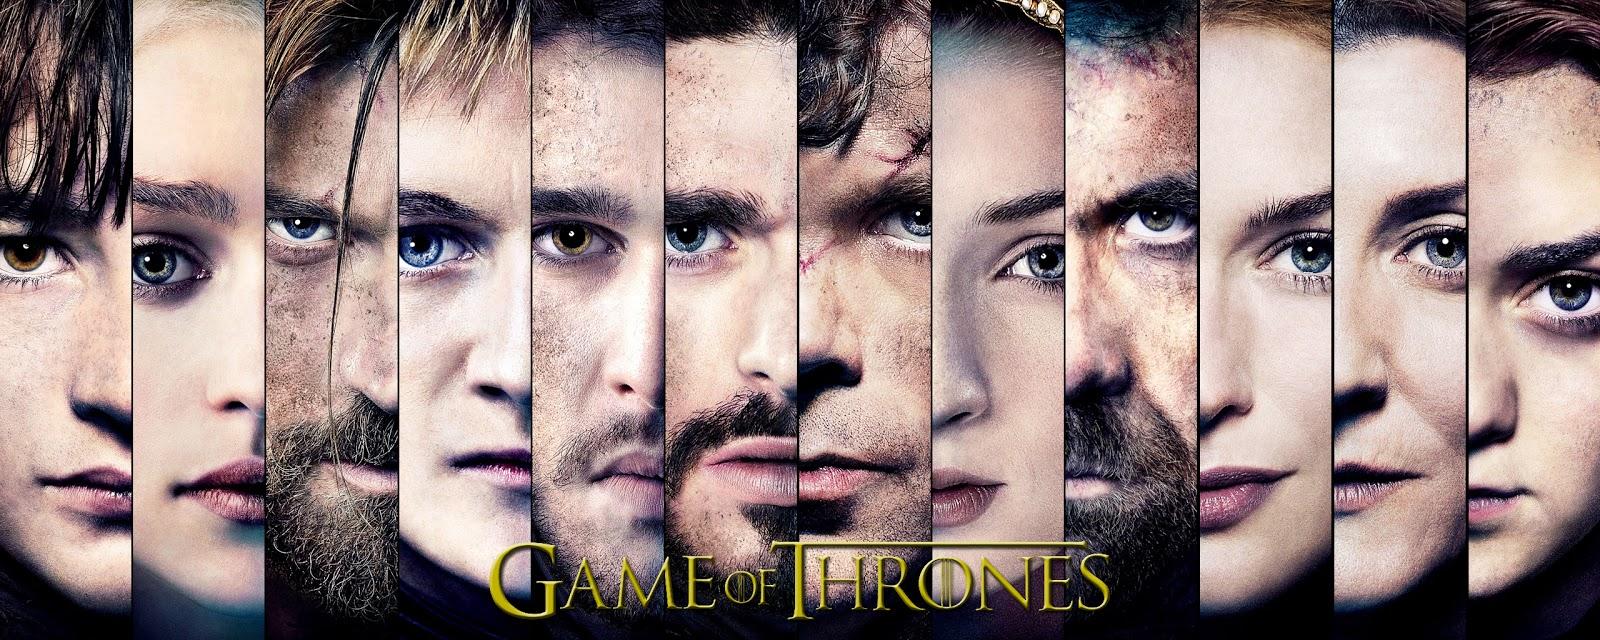 Game of Thrones 5: video dal set e nuovi spoiler